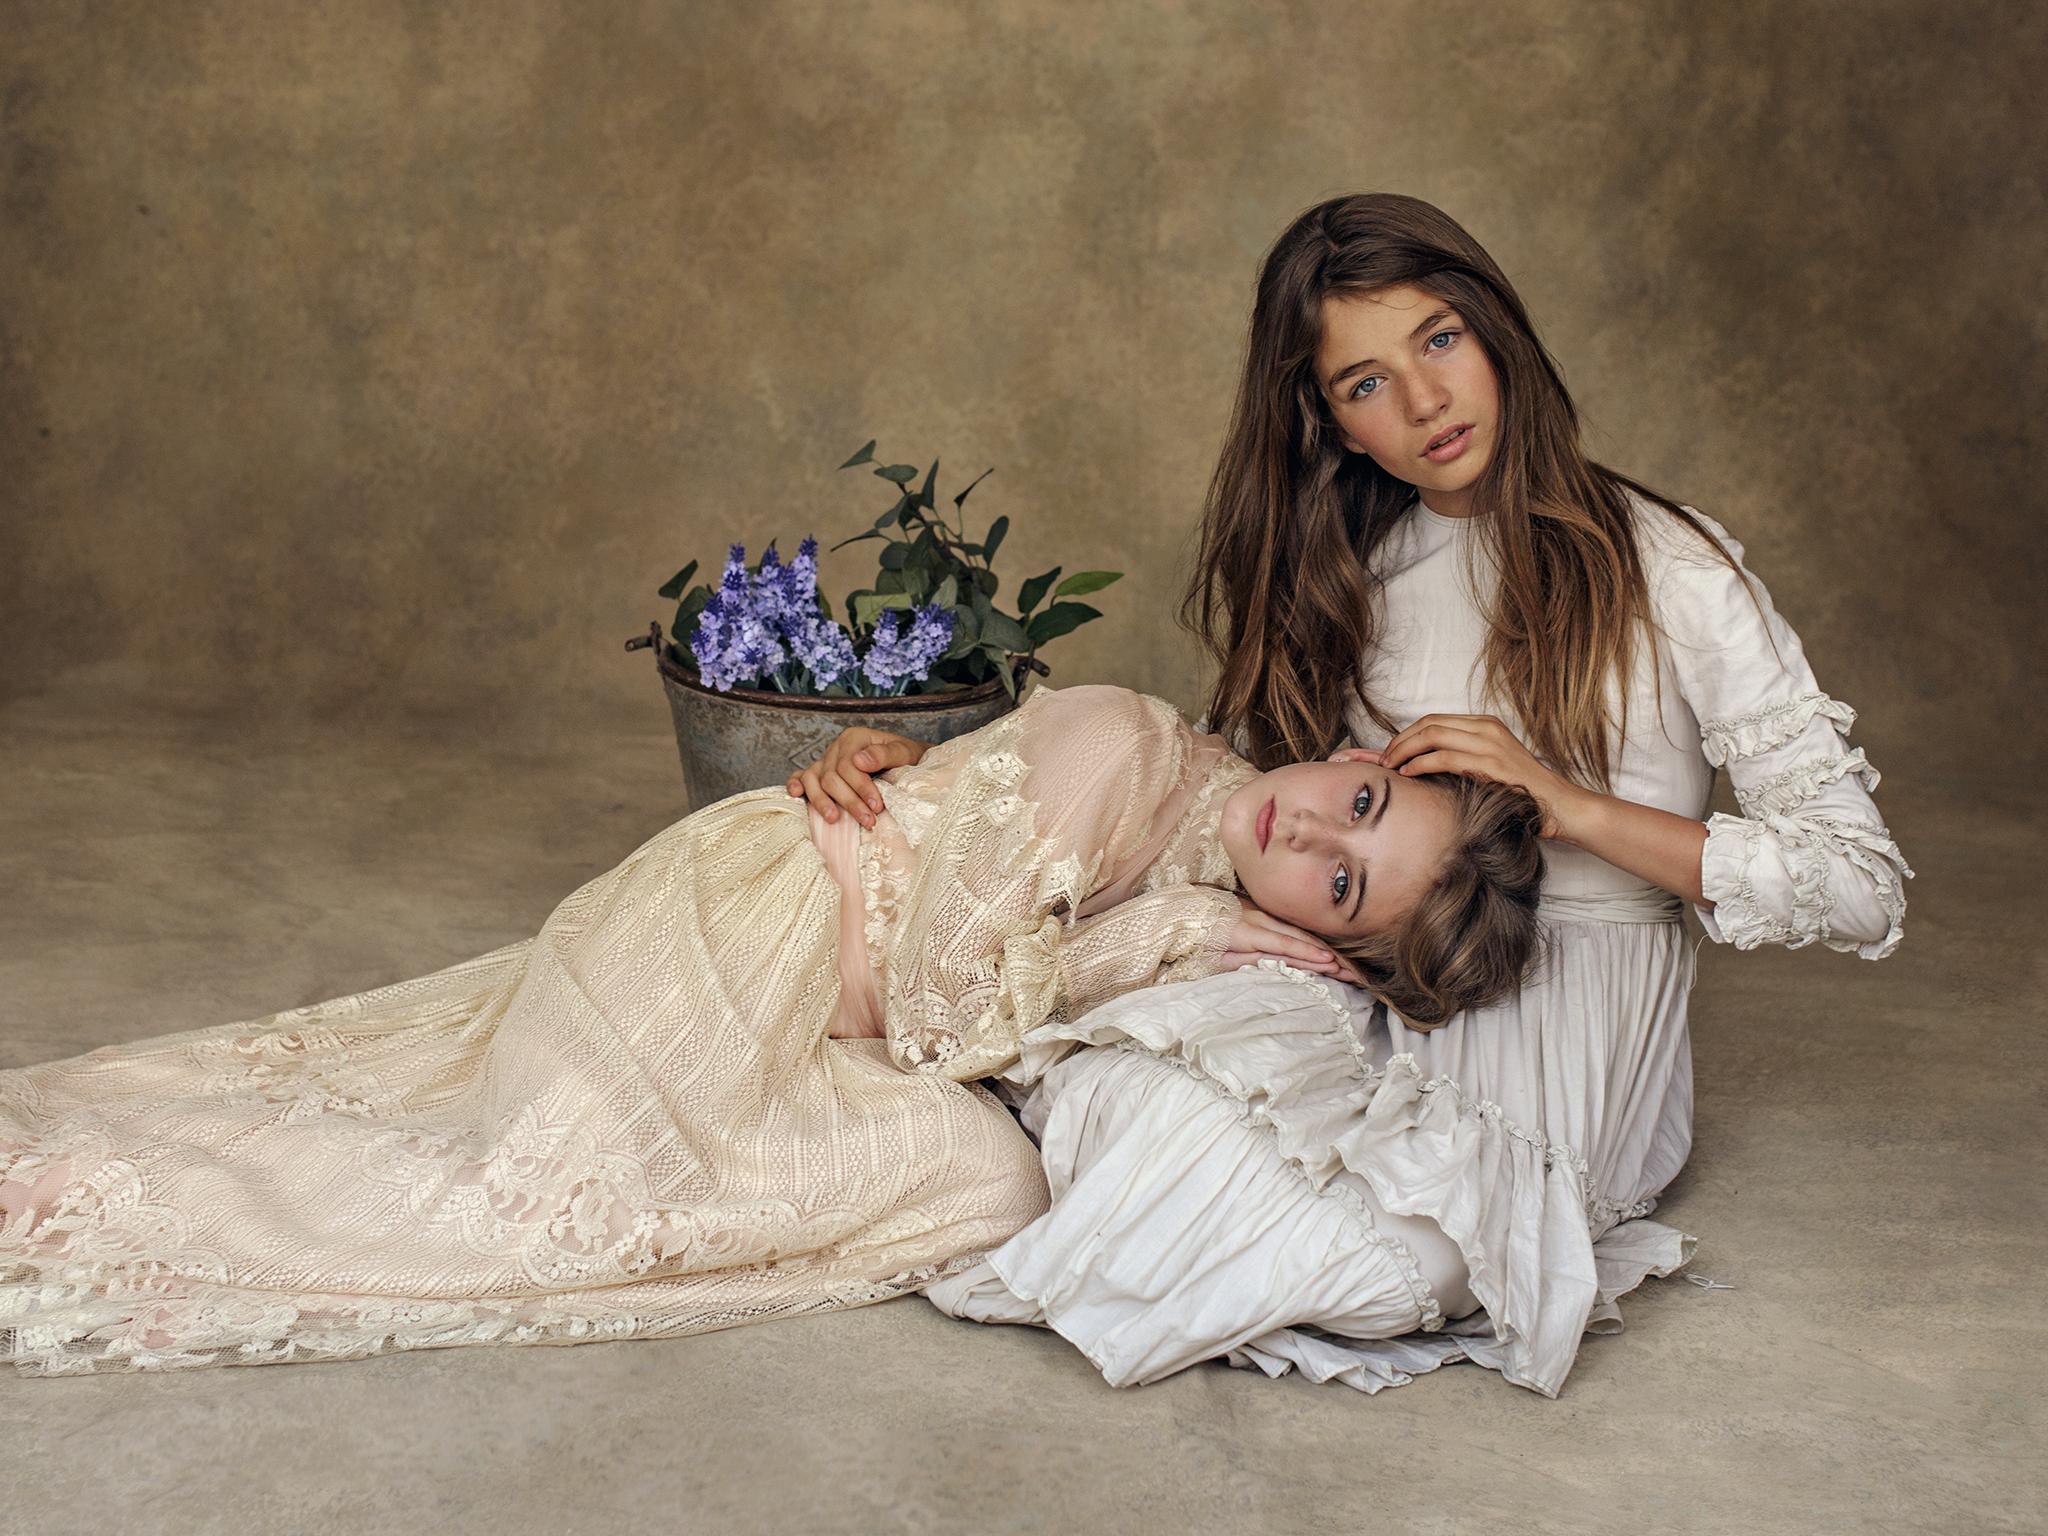 Michael Stief Childrens Photography 9.jpg